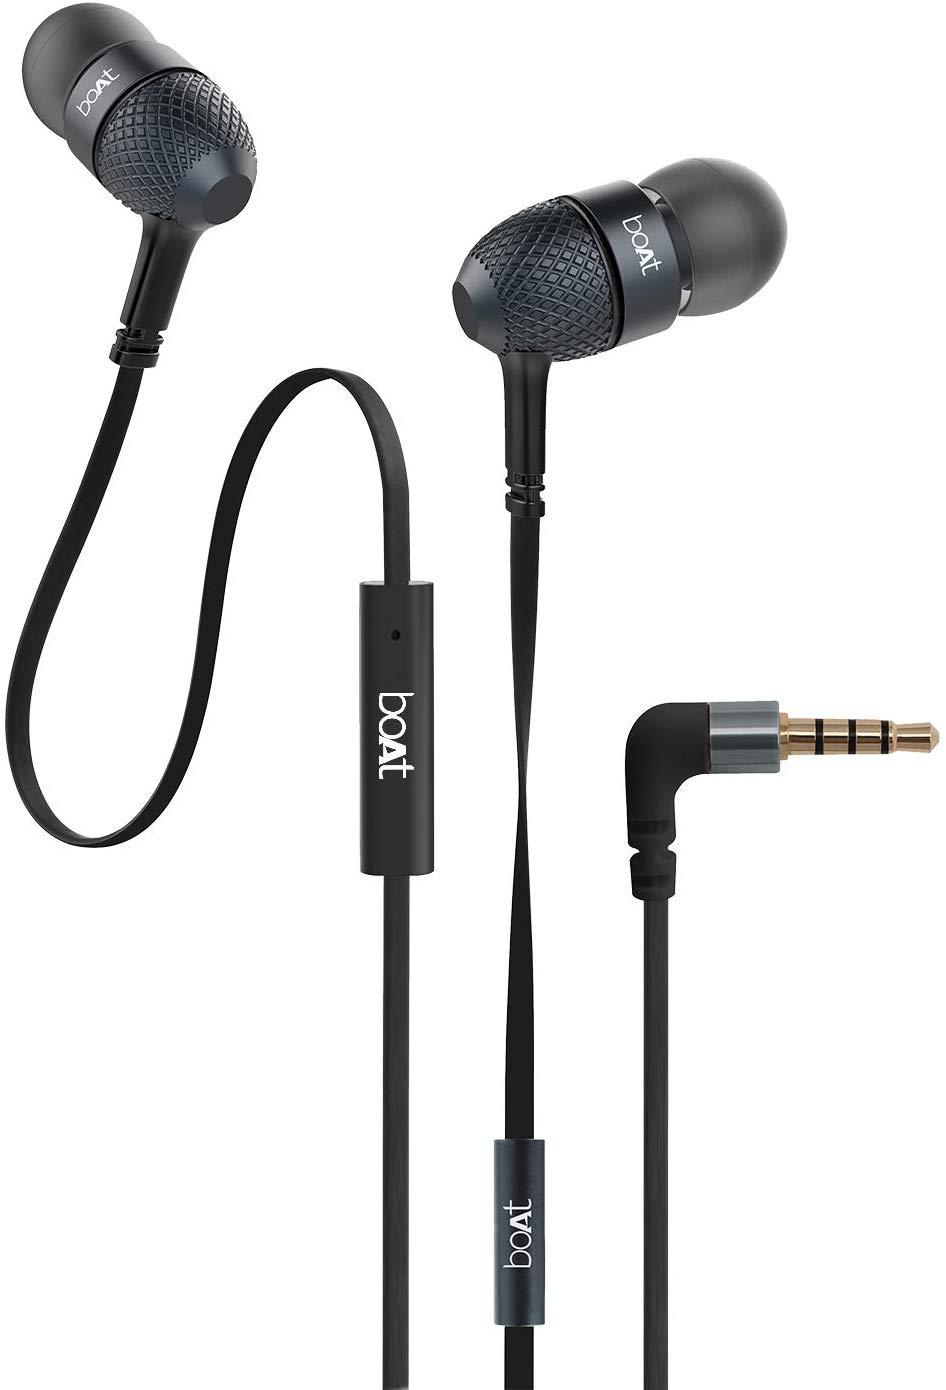 Best earphone under 500 with Mic